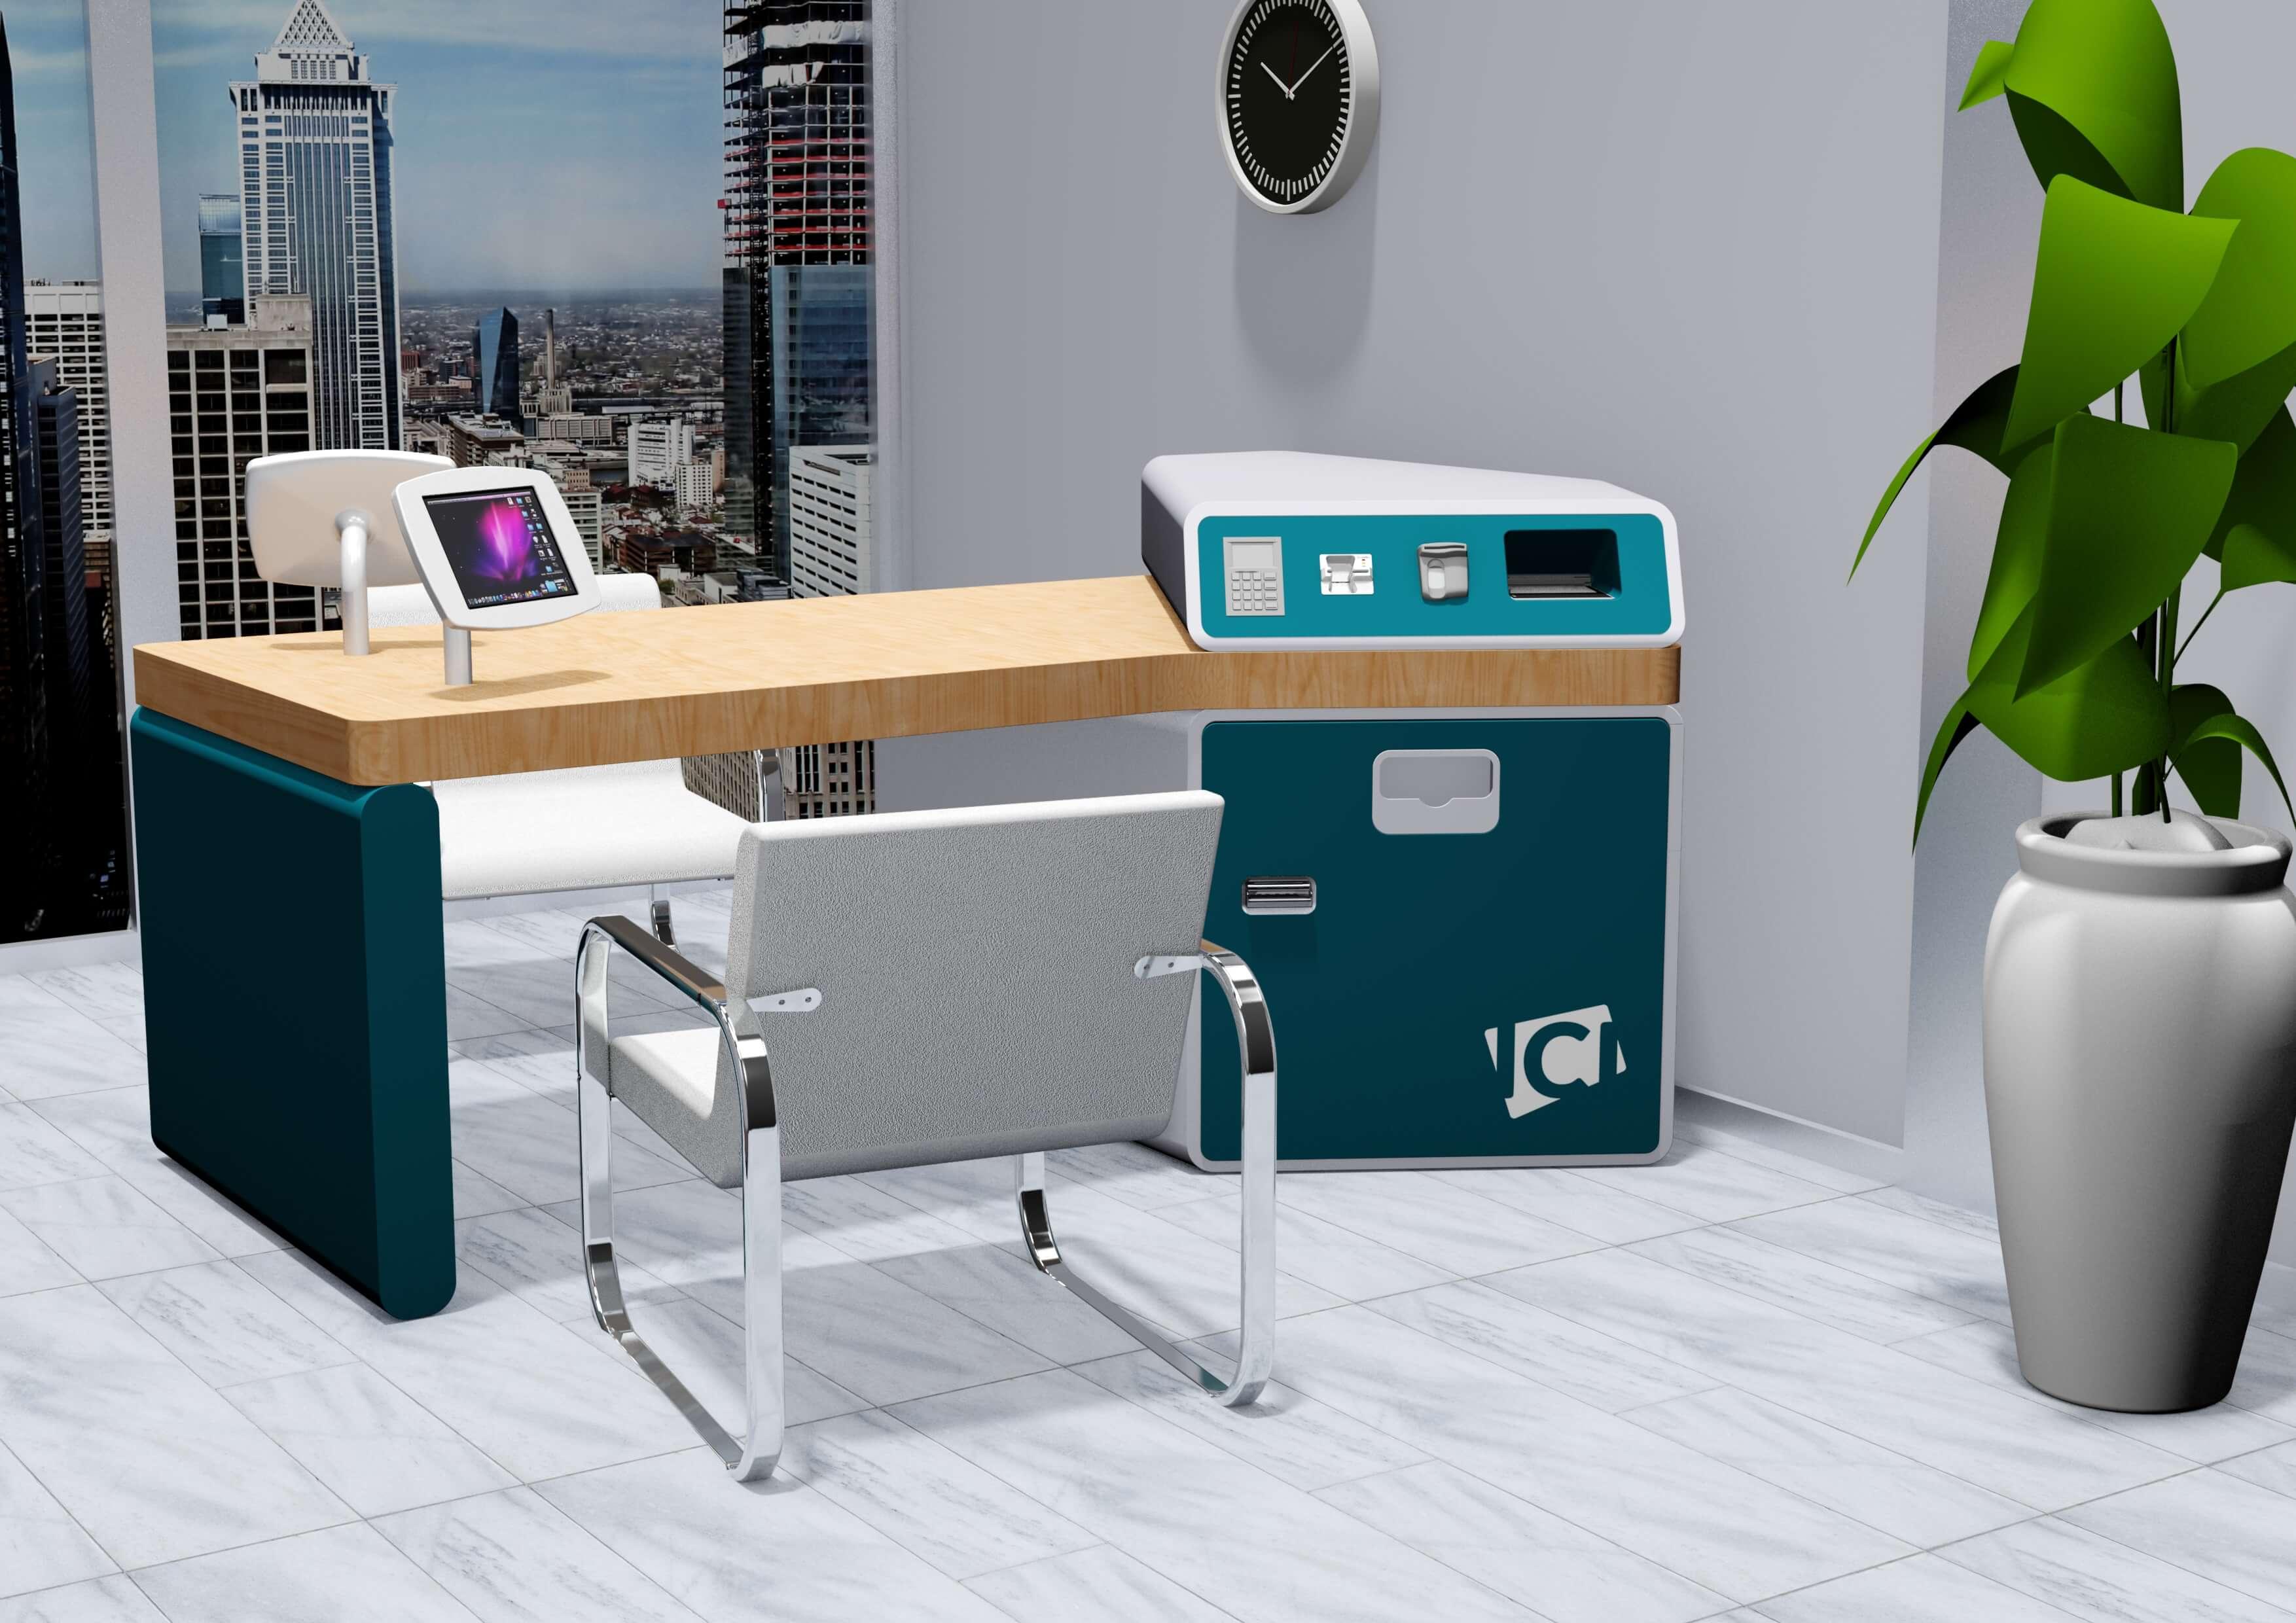 ICI Bank Desk - Customer